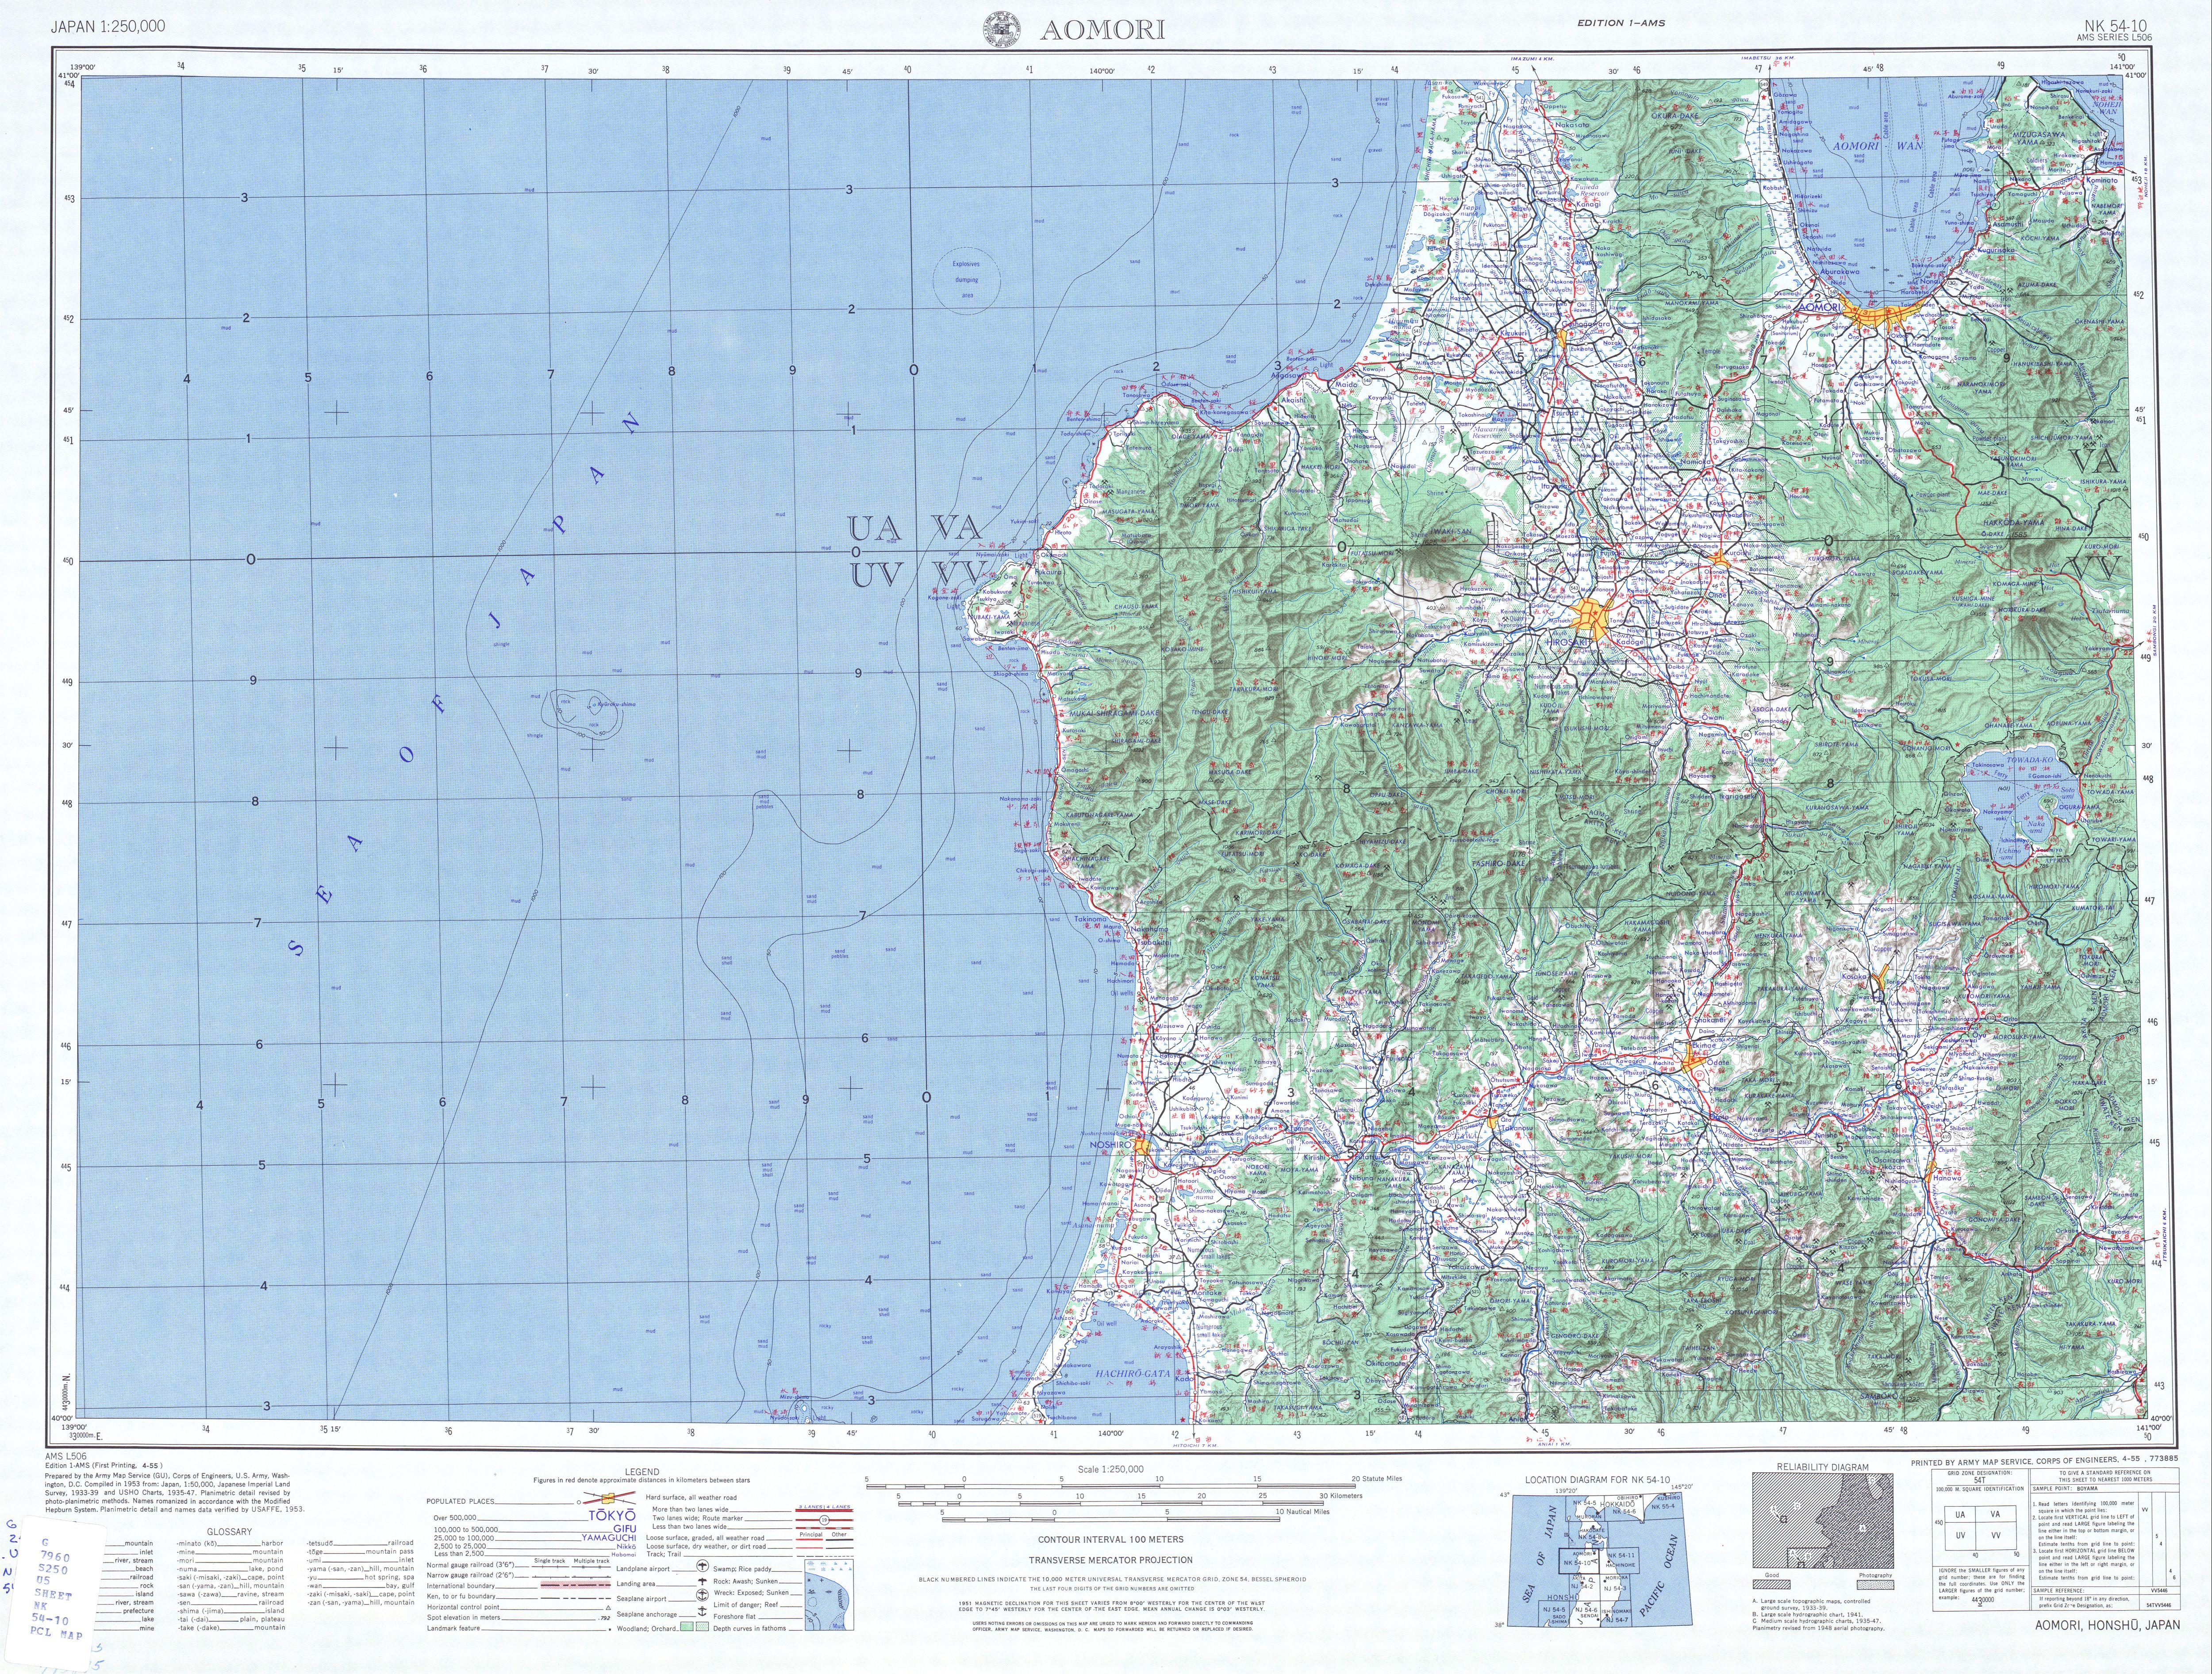 Aomori Topographic Map Sheet, Japan 1954